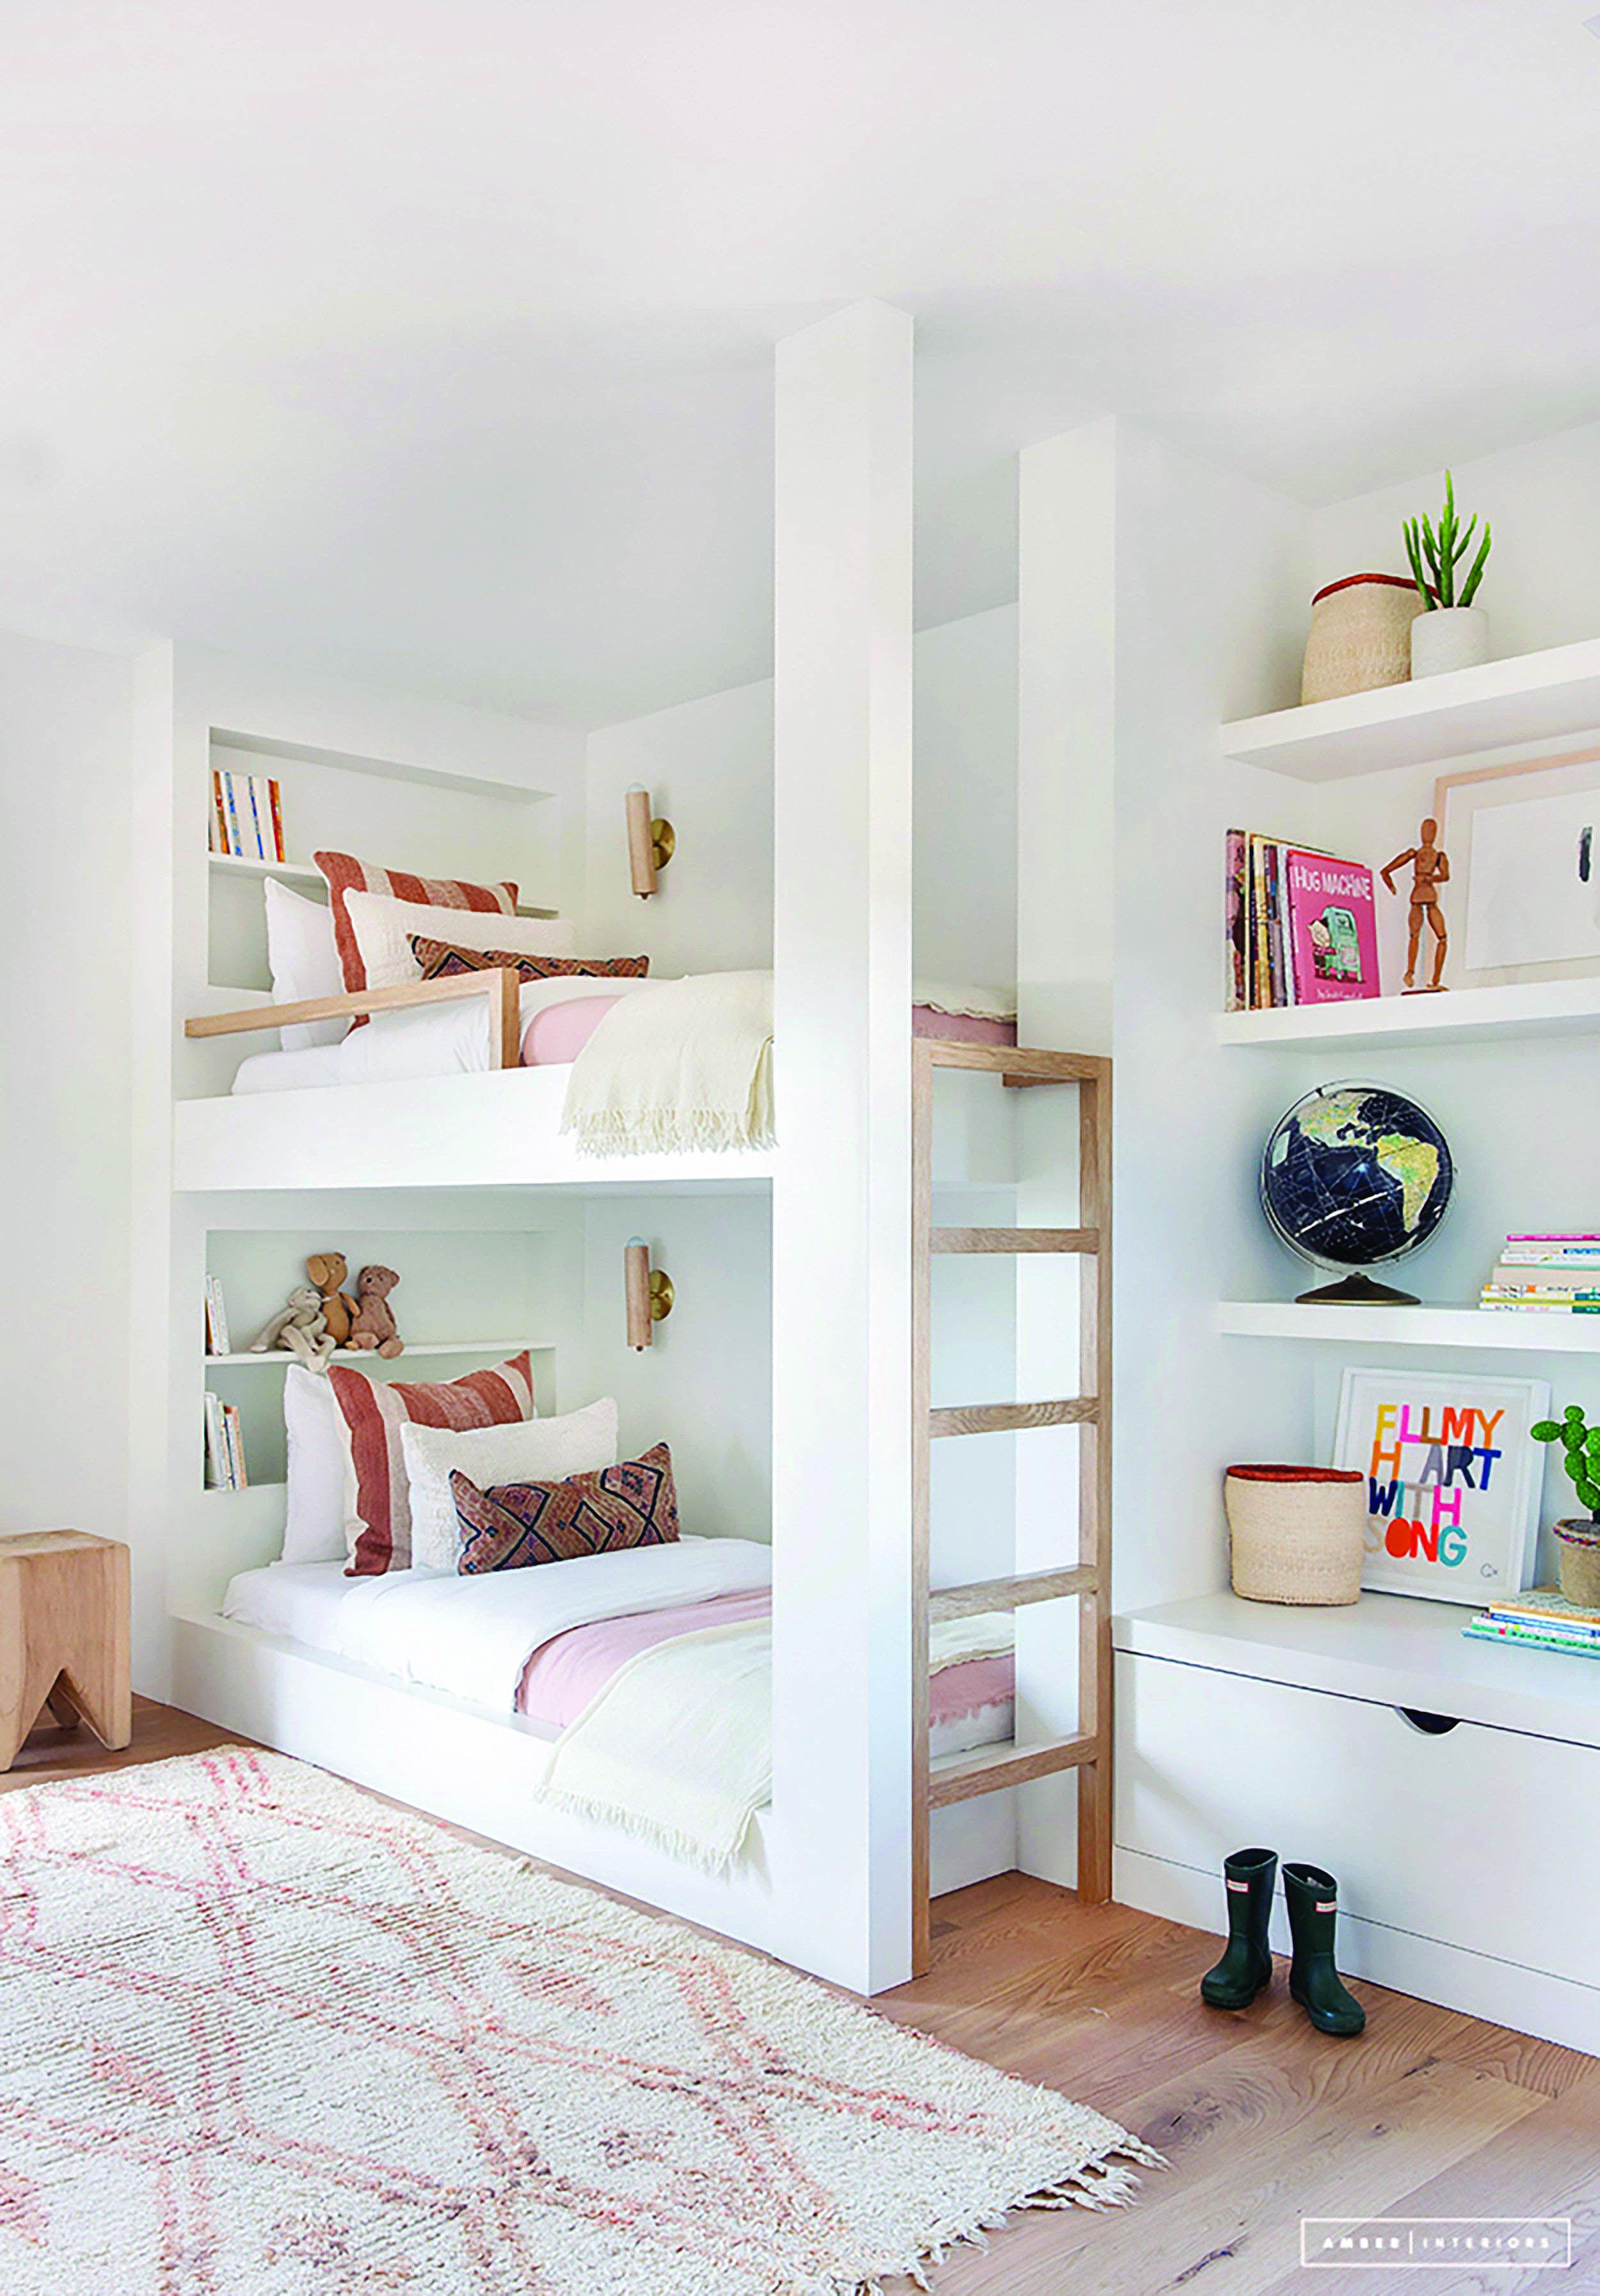 Great Fixer Upper Modern Bedroom Just On Home Design Ideas Site Kids Bedroom Designs Kids Room Design Kids Bedroom Decor